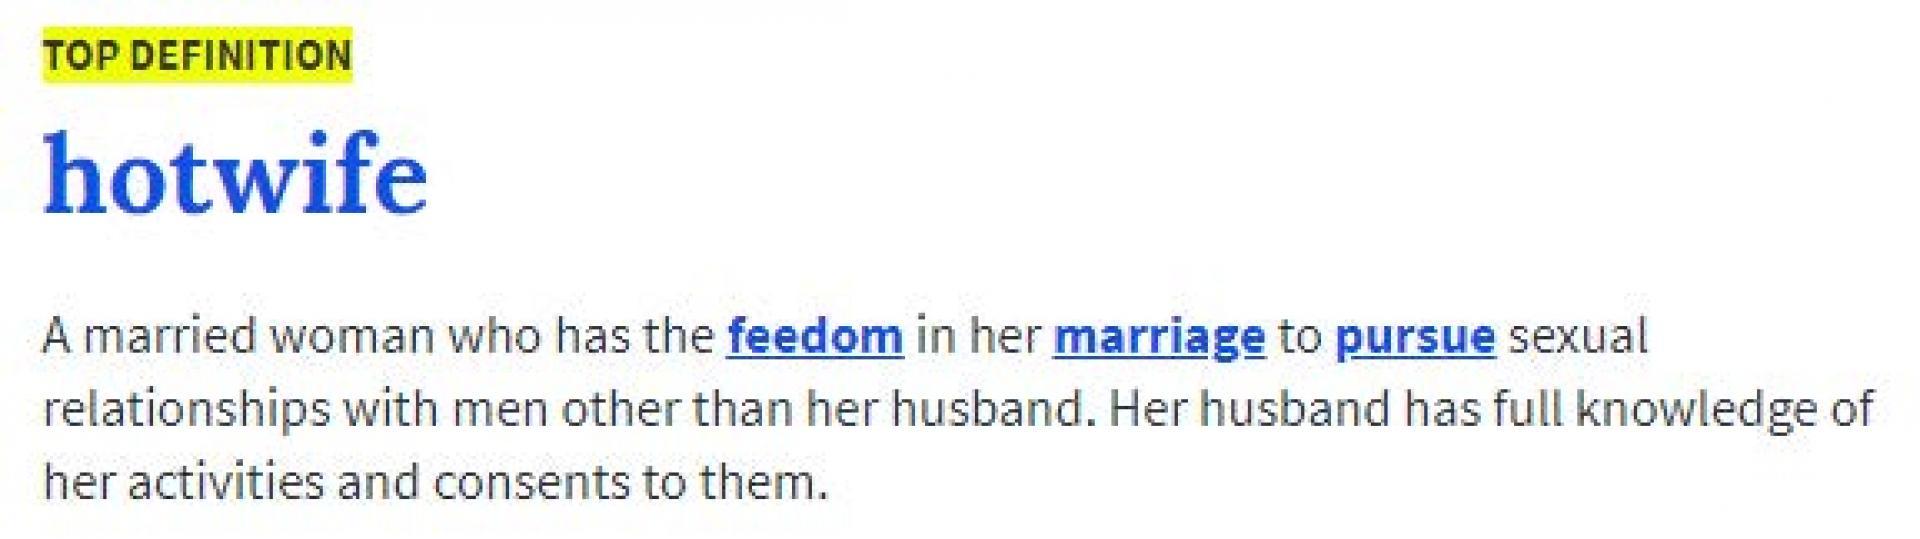 Urban Dictionary Hotwife Definition